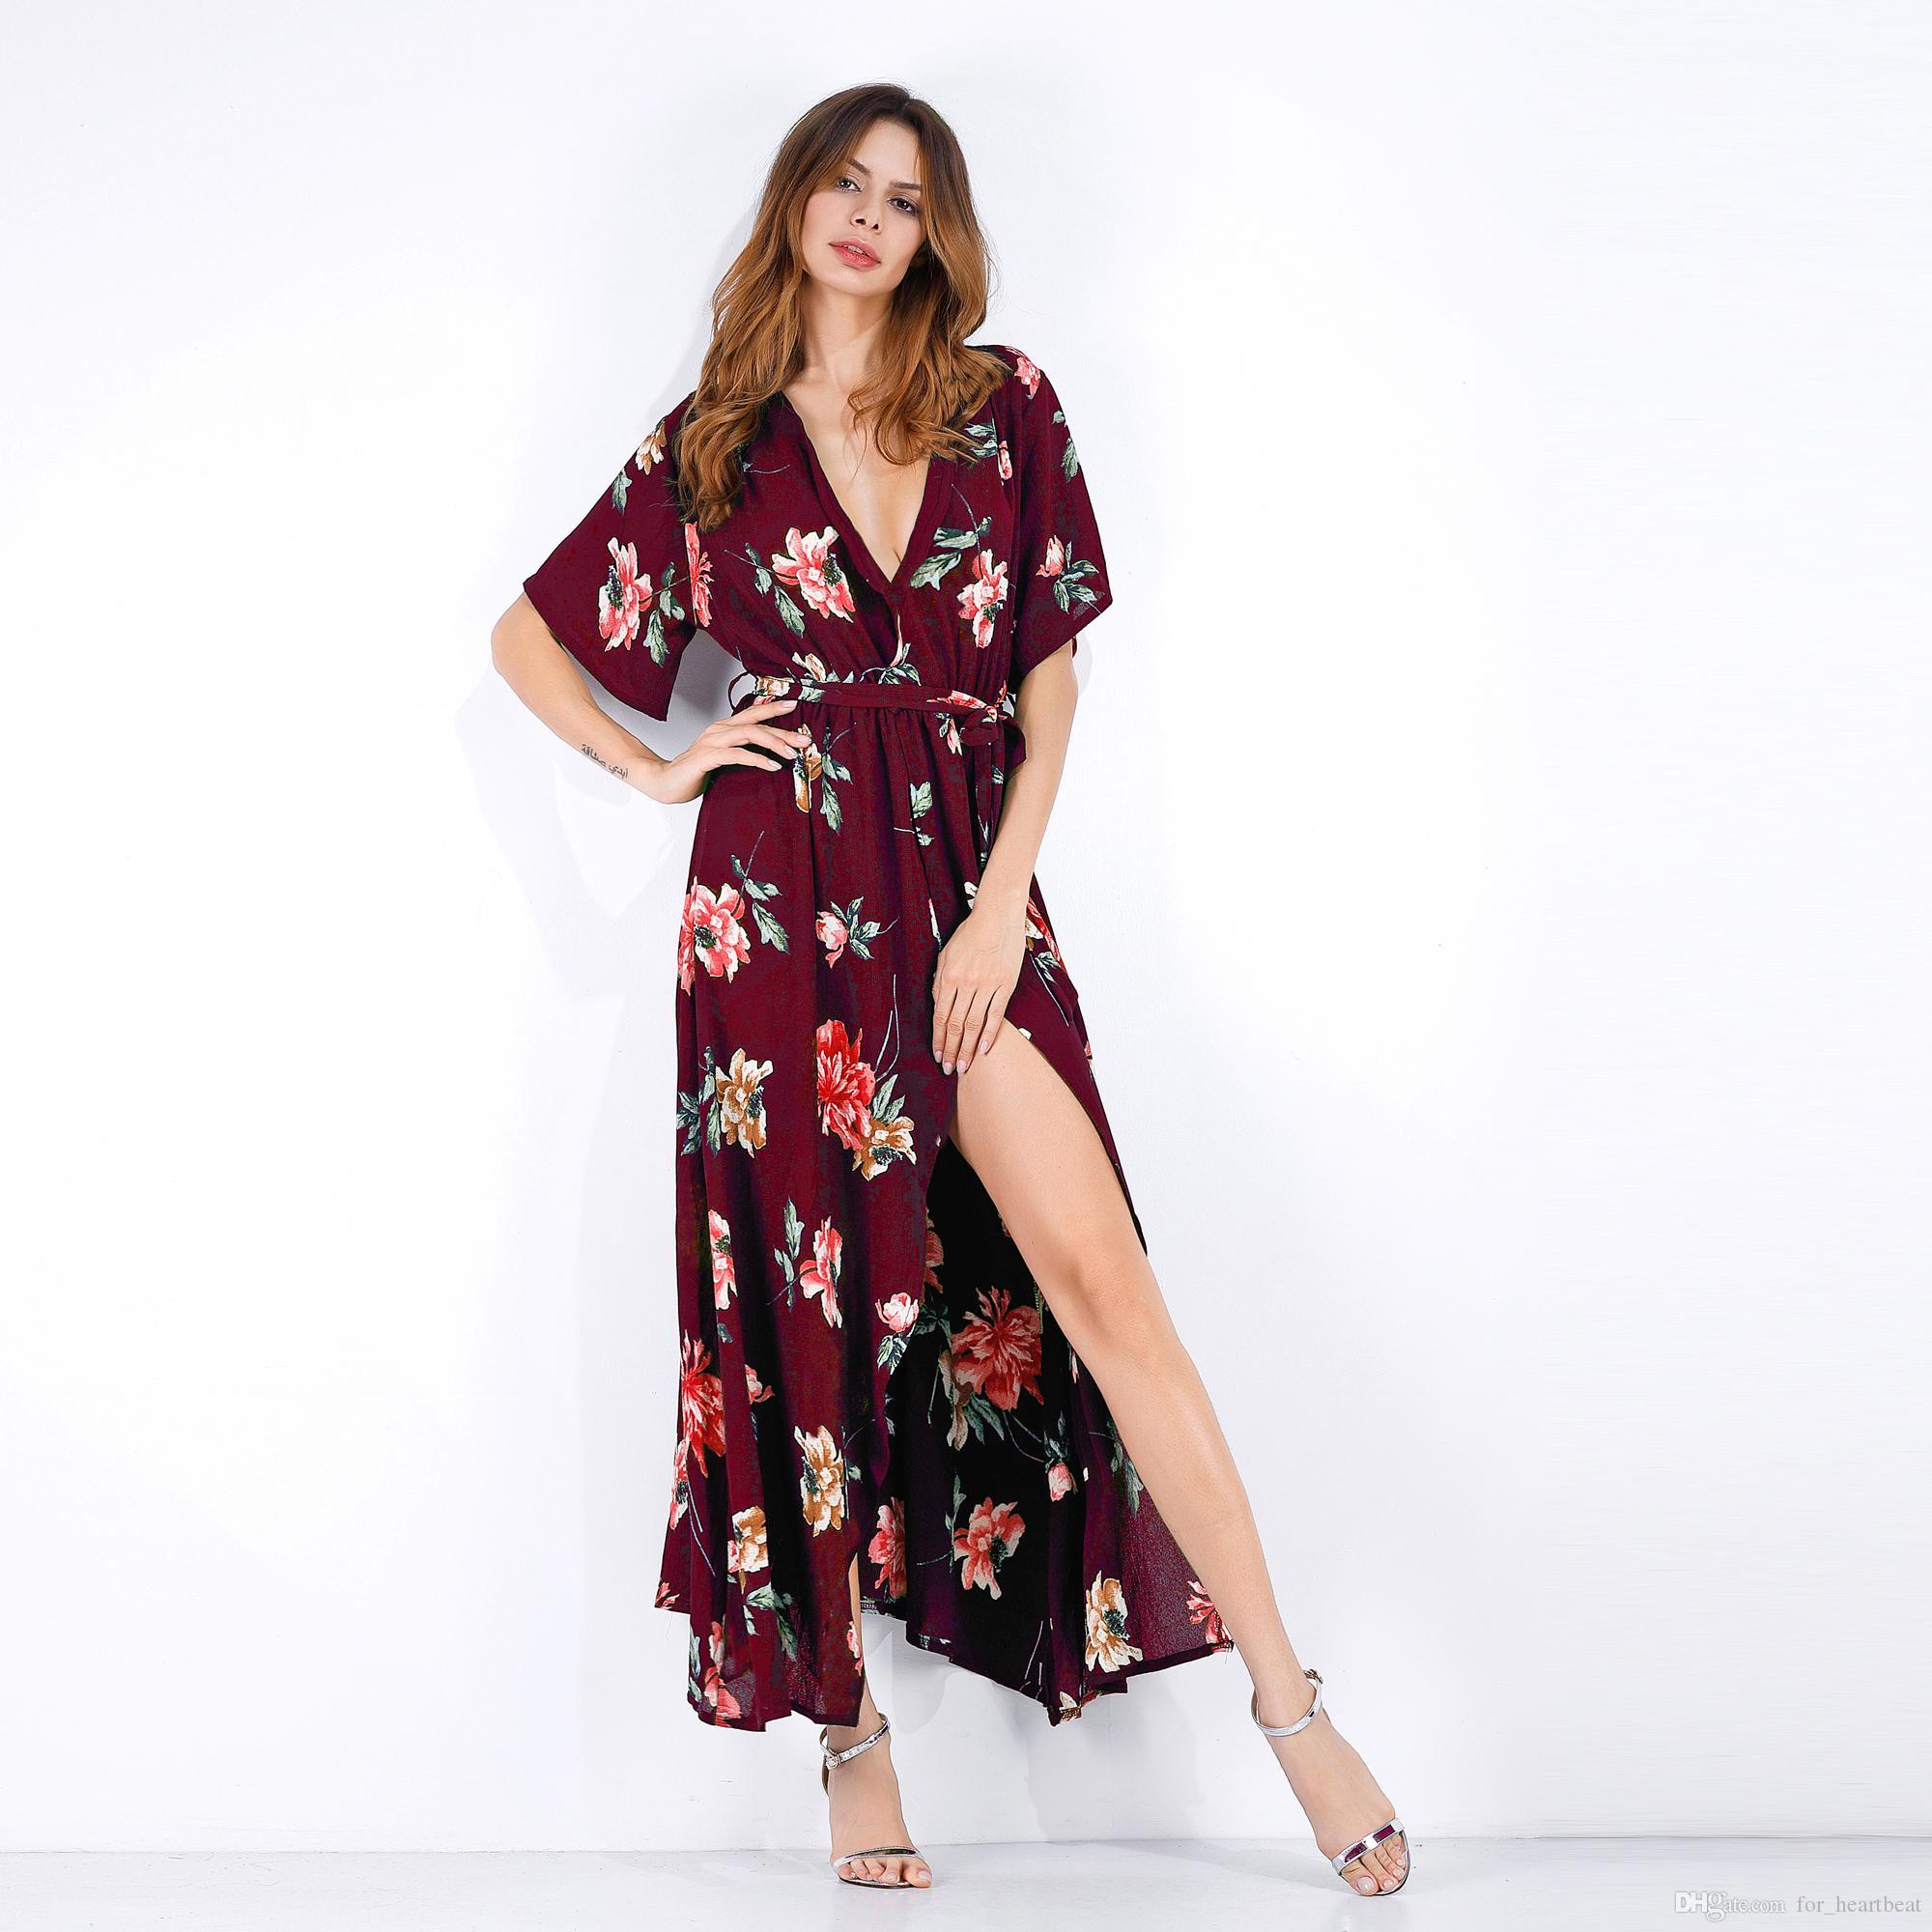 a53c8b5485 Gifts For Women Mom Dresses Boho V Neck Floral Printed Long Dress Short  Sleeve Split Lace Up Summer Skirt Sexy Beach Long Evening Dresses Velvet  Dress From ...